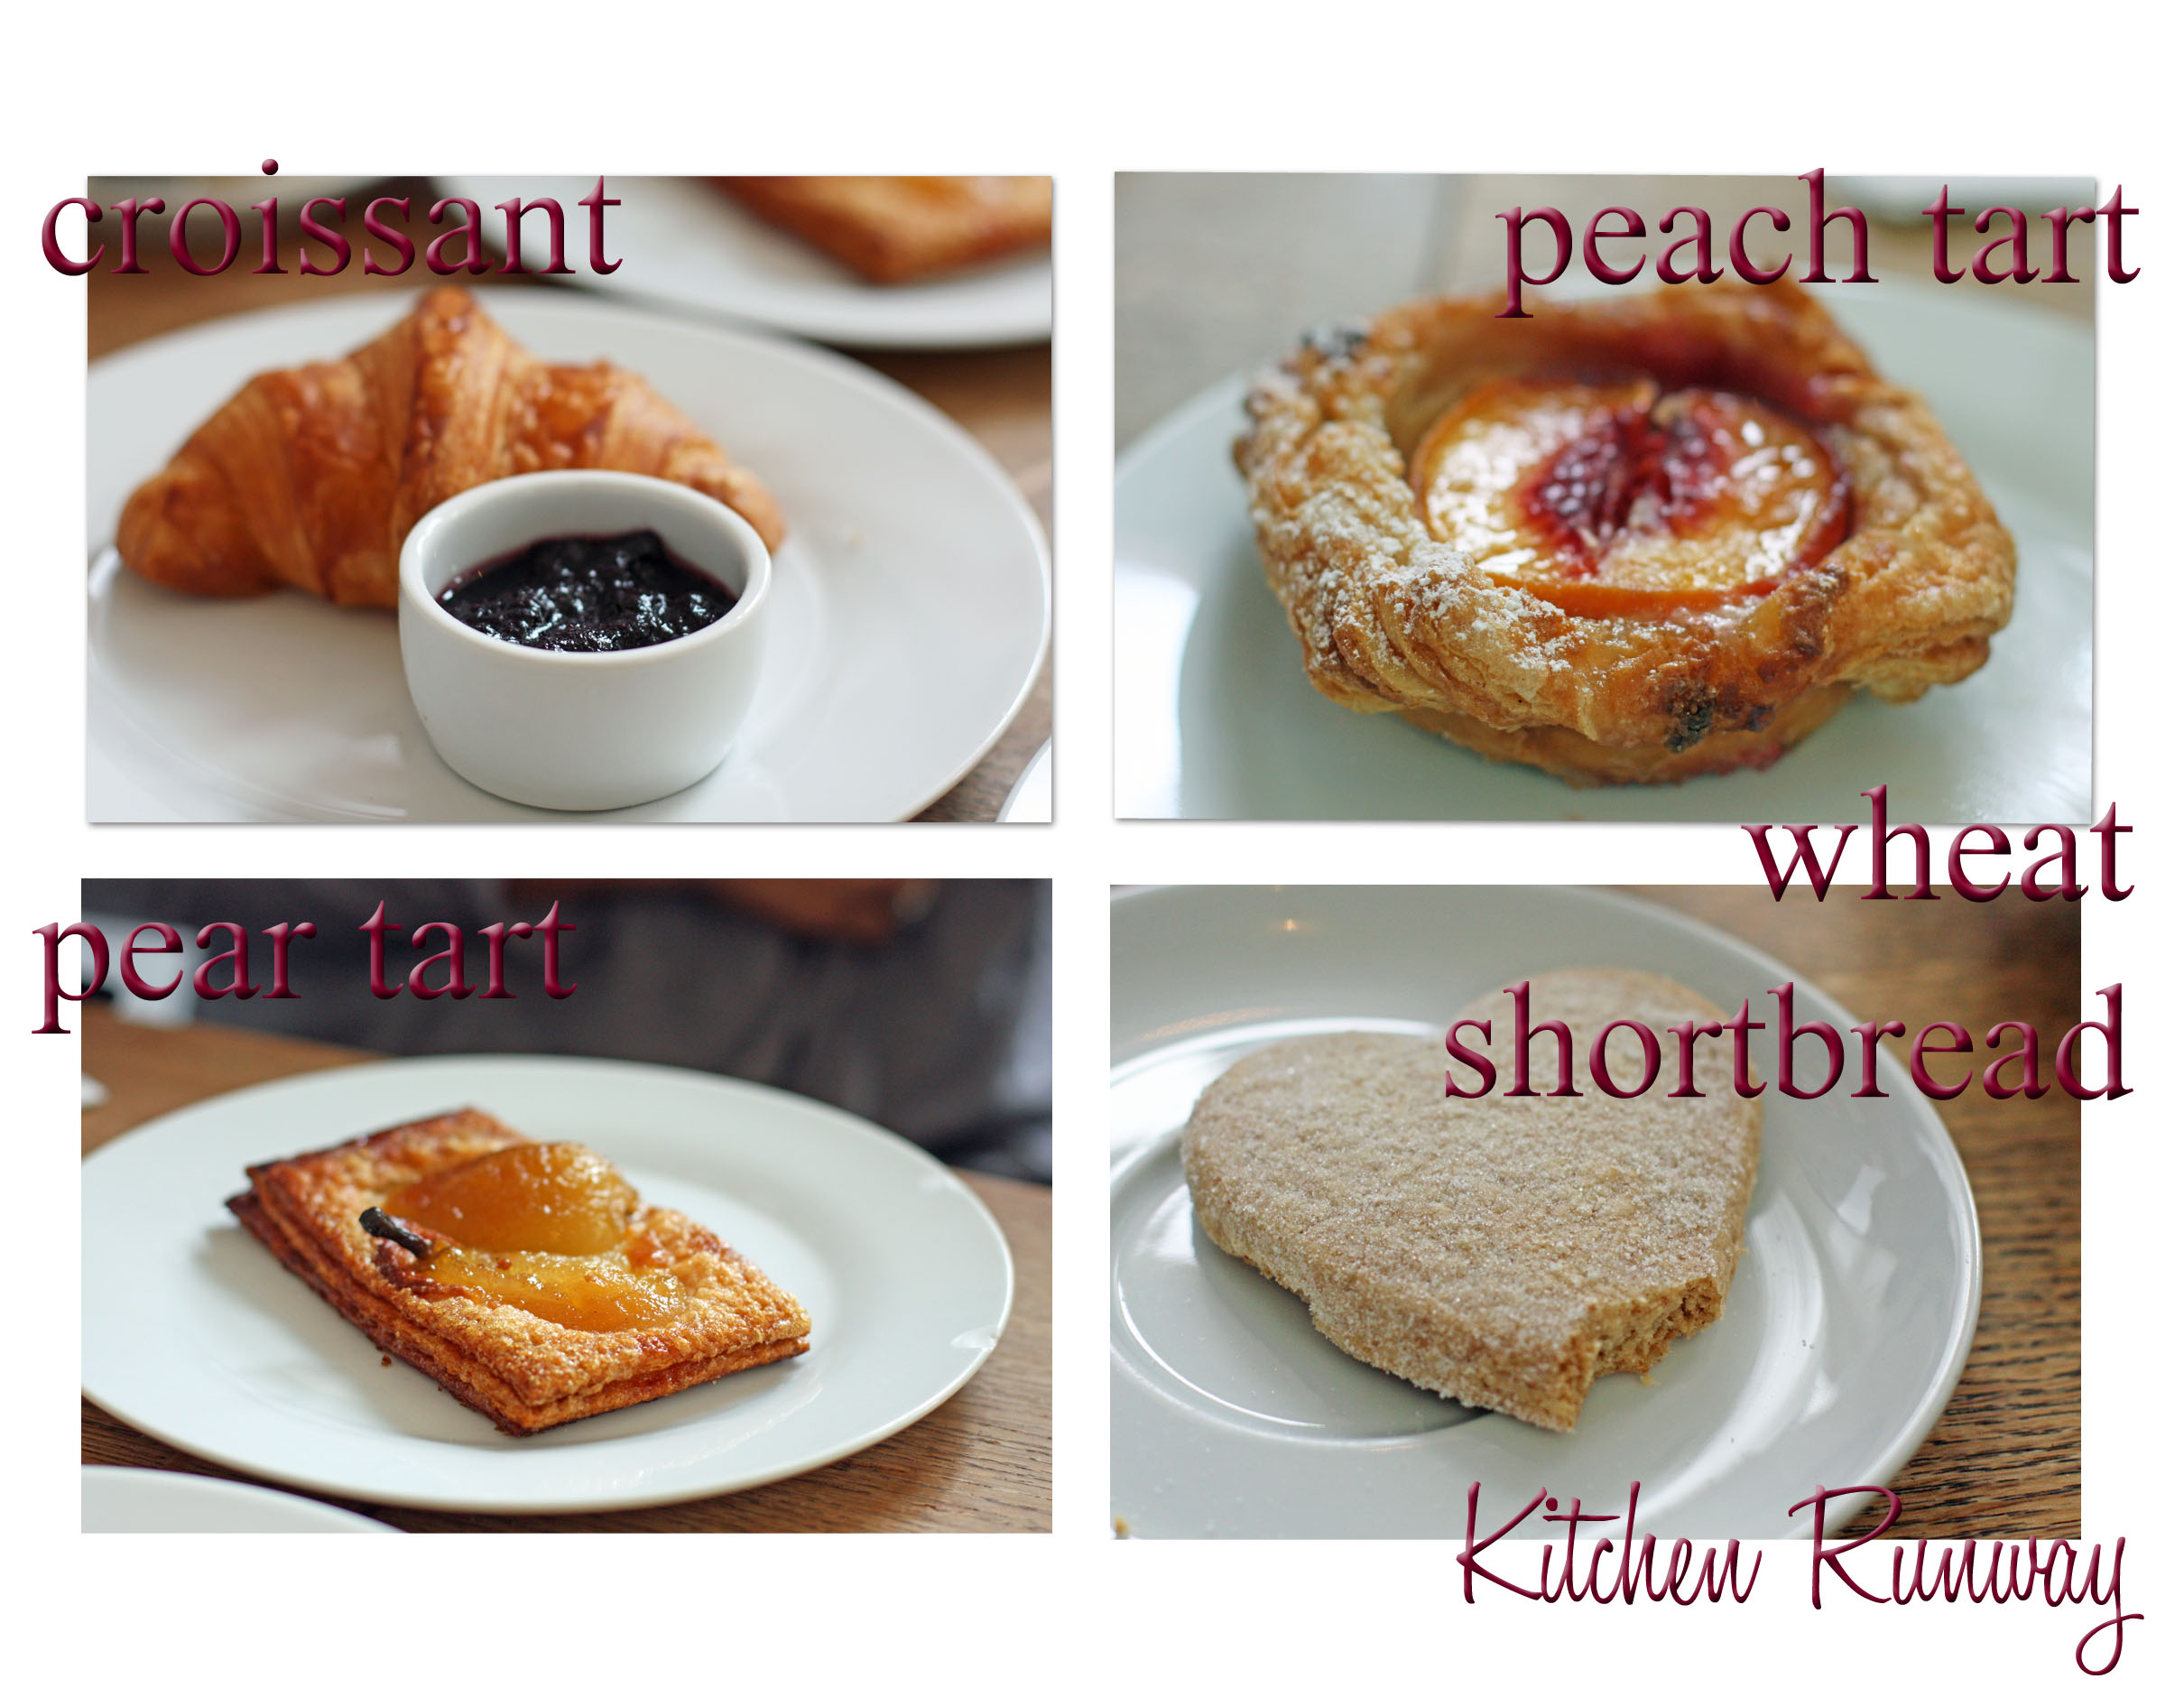 huckleberry pastries